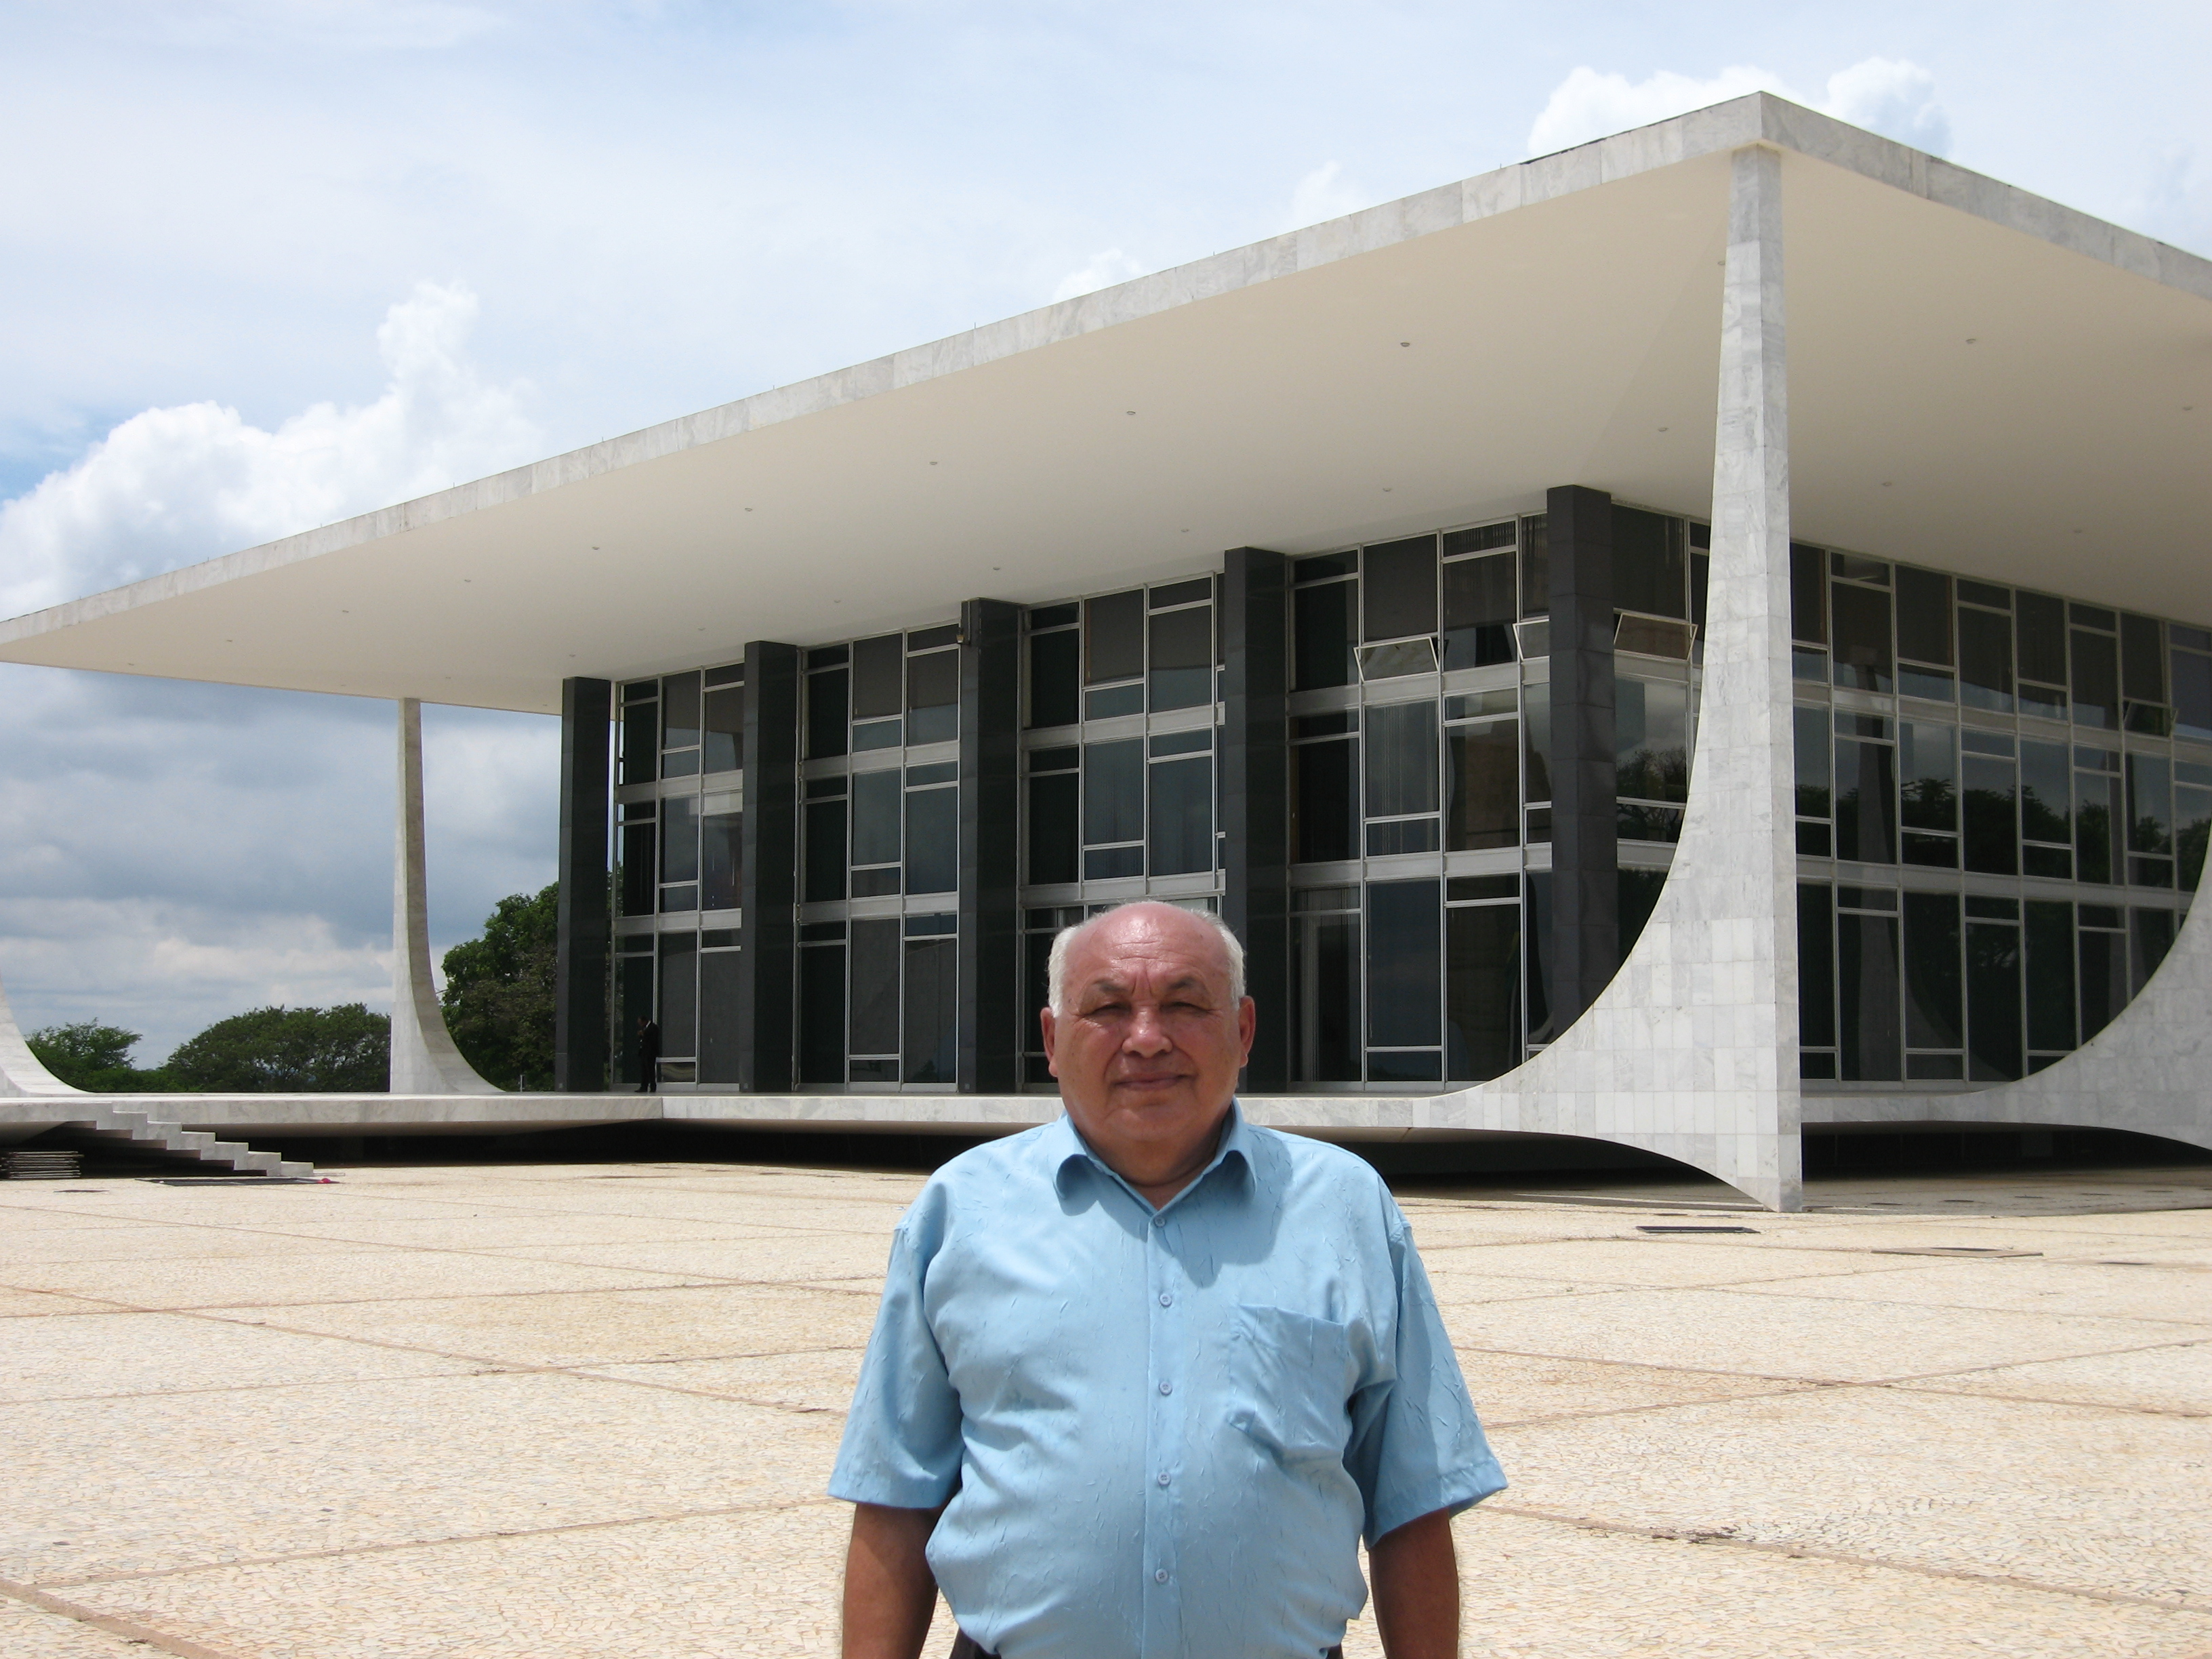 Brasilia_12_1008